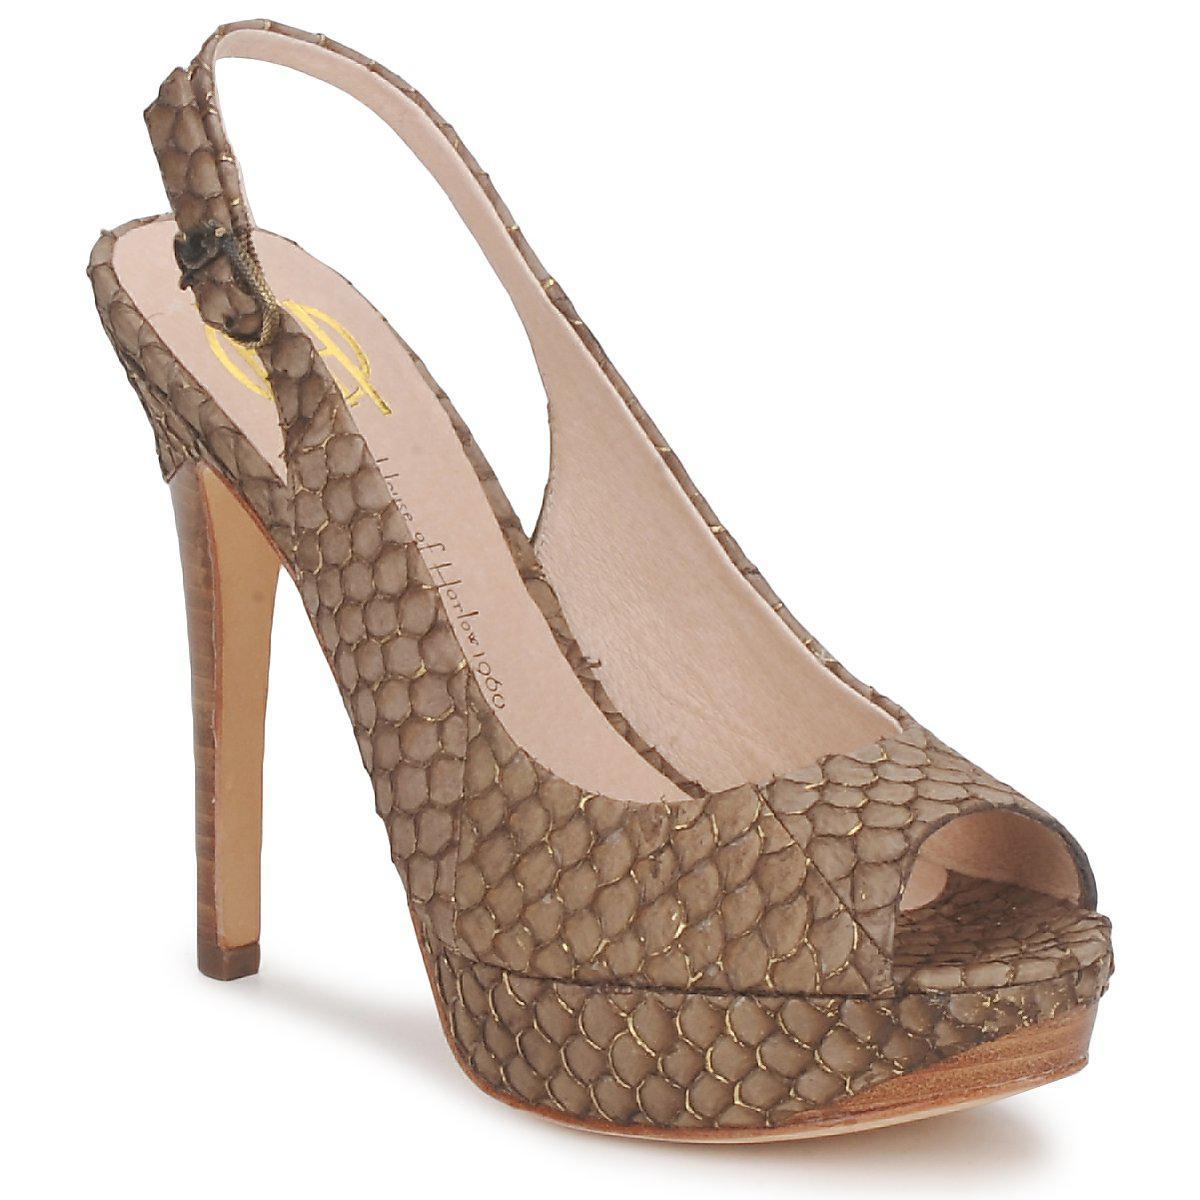 de248f3c3ab408 House of Harlow 1960 Nadya Women s Sandals In Brown in Brown - Lyst